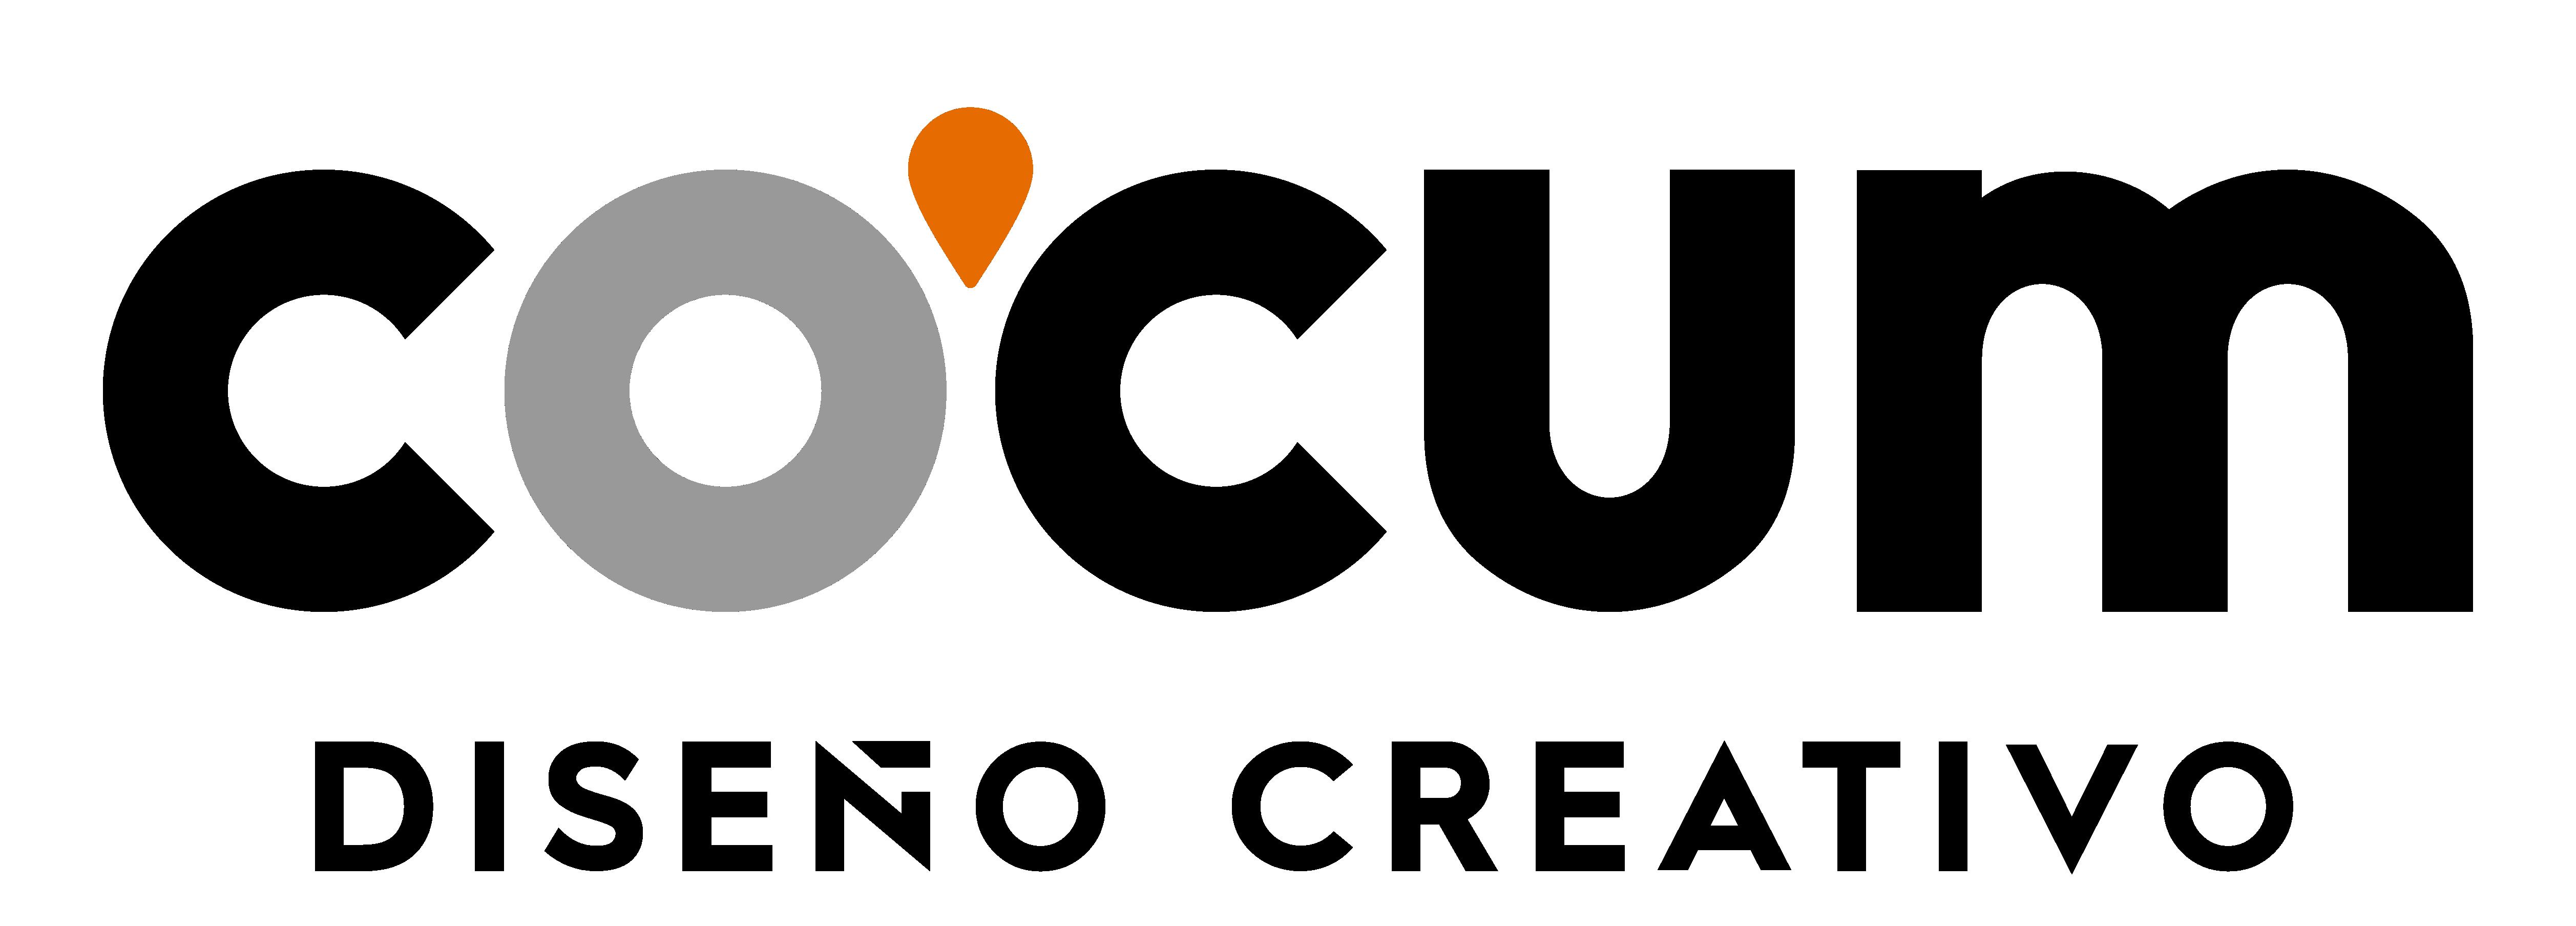 cocum · diseño creativo